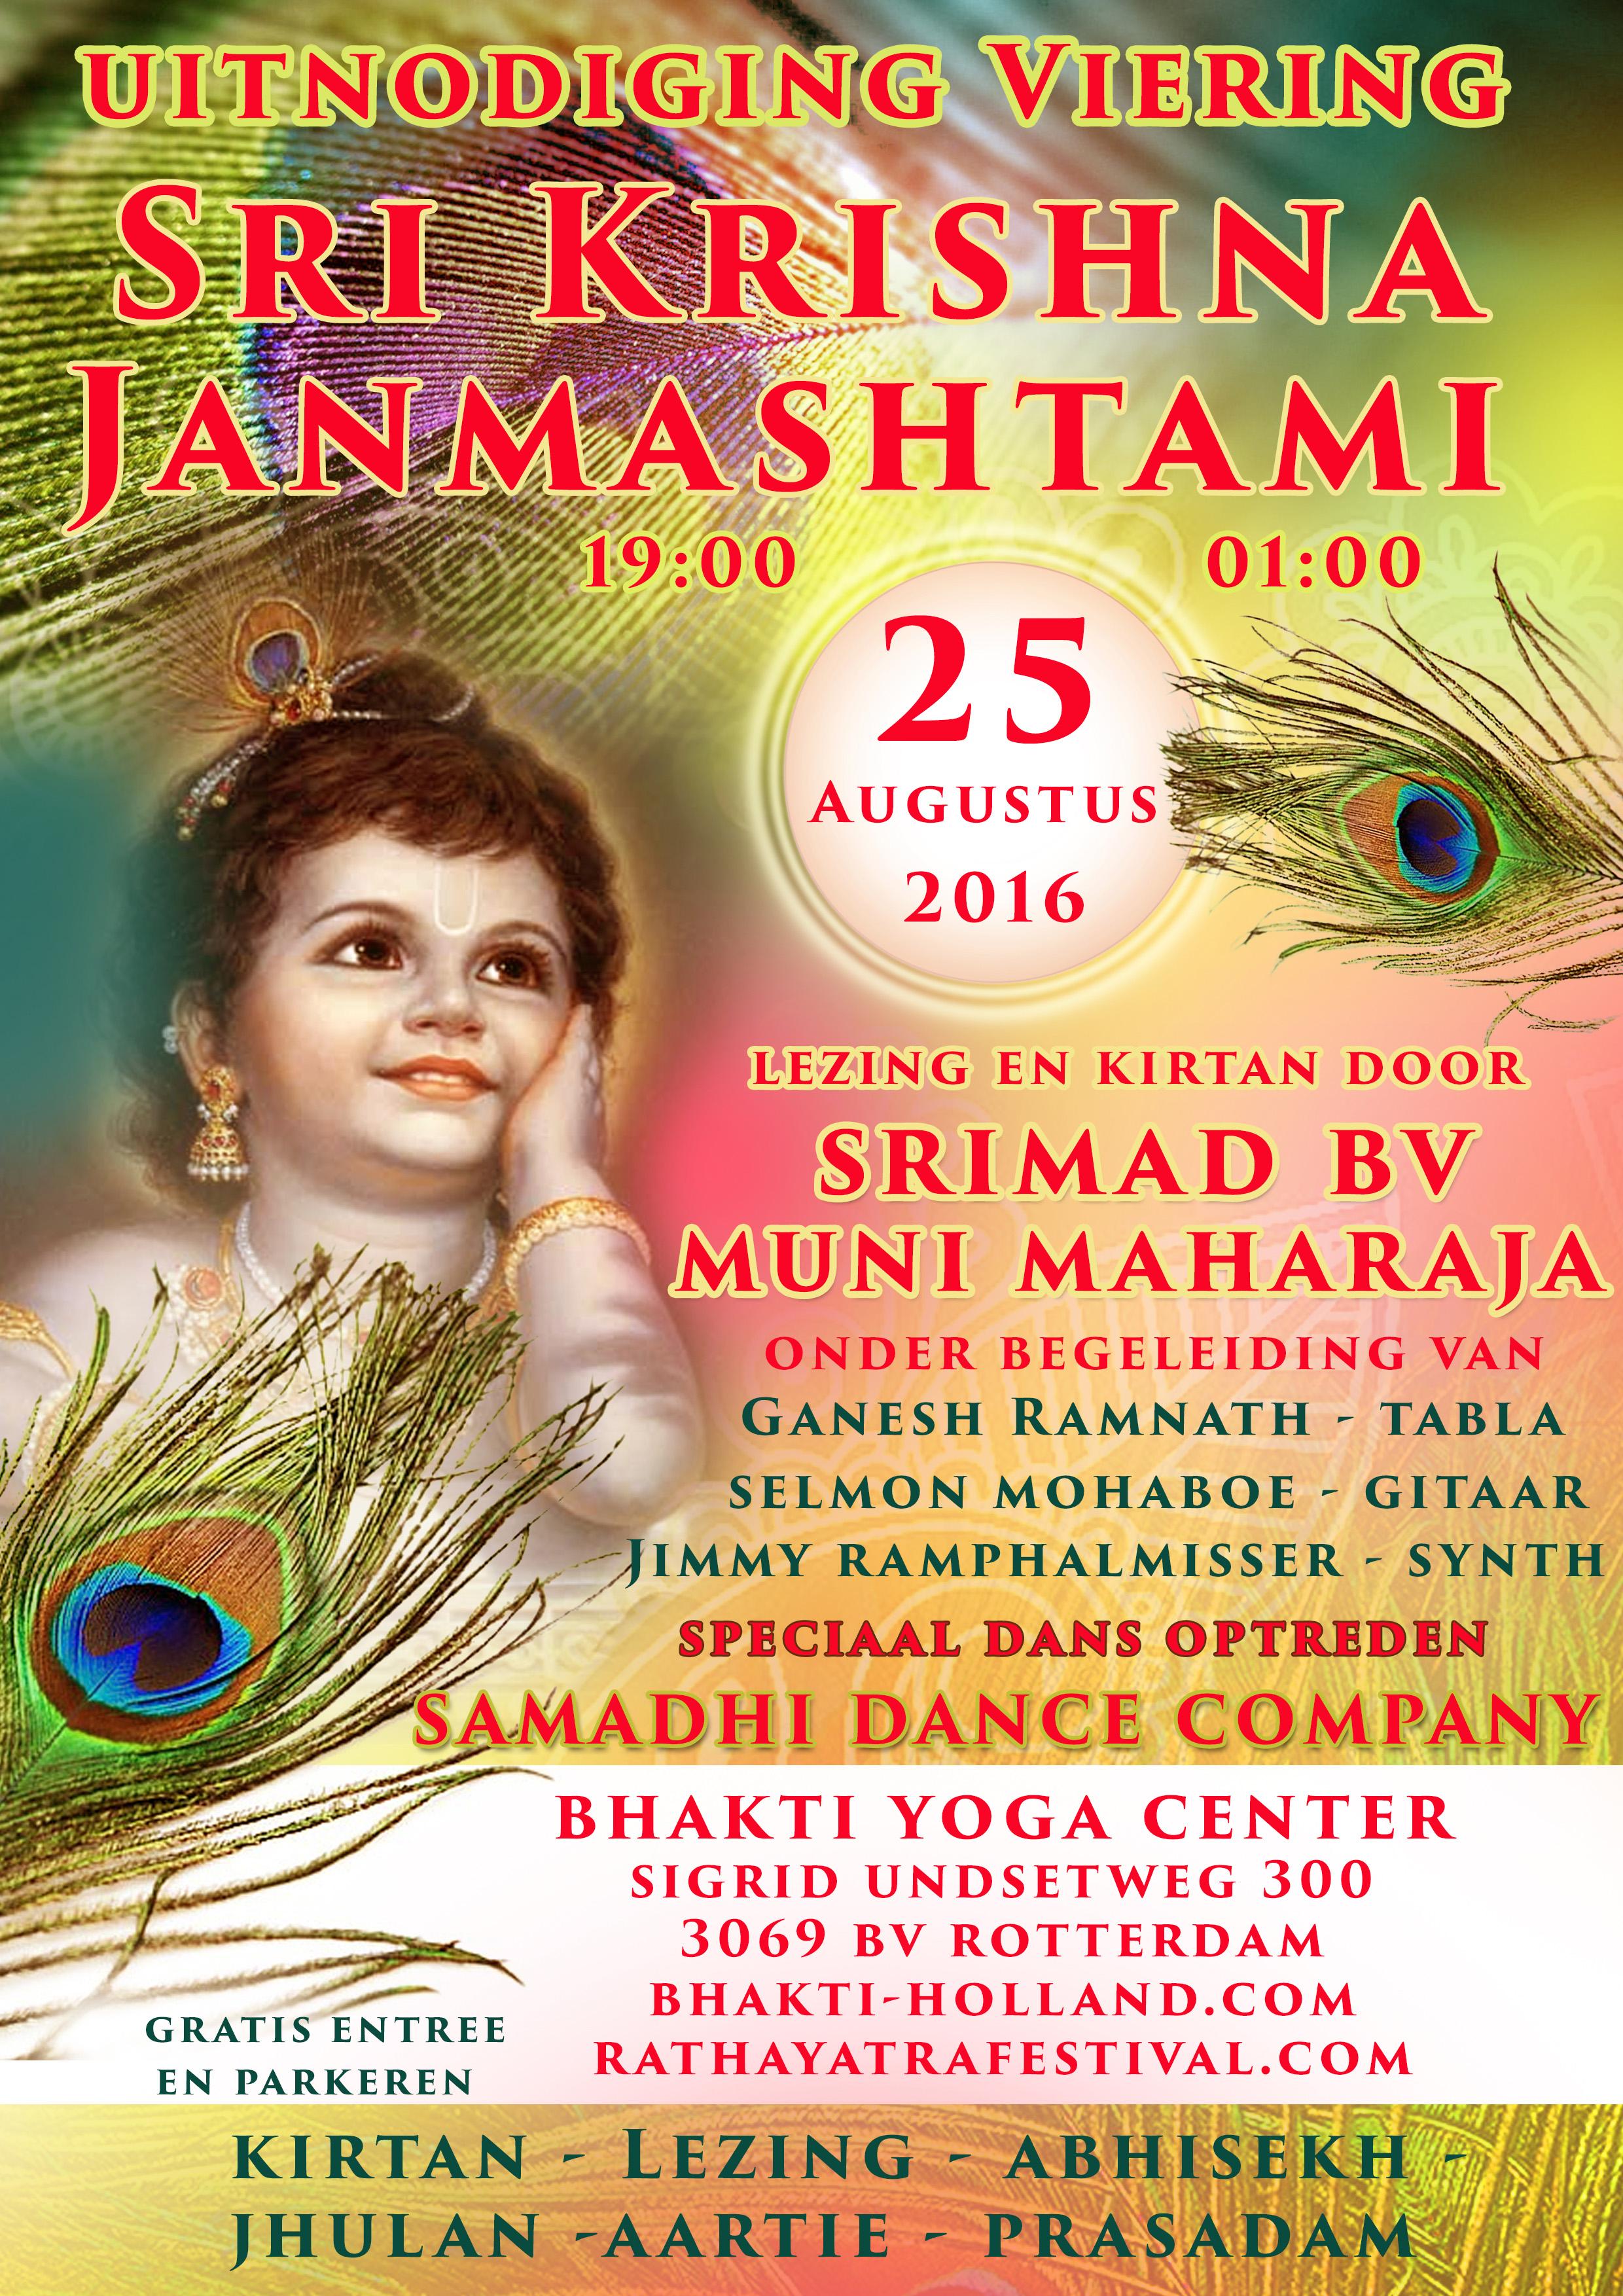 Krishna-janmasthami-bhakti-holland-25082016